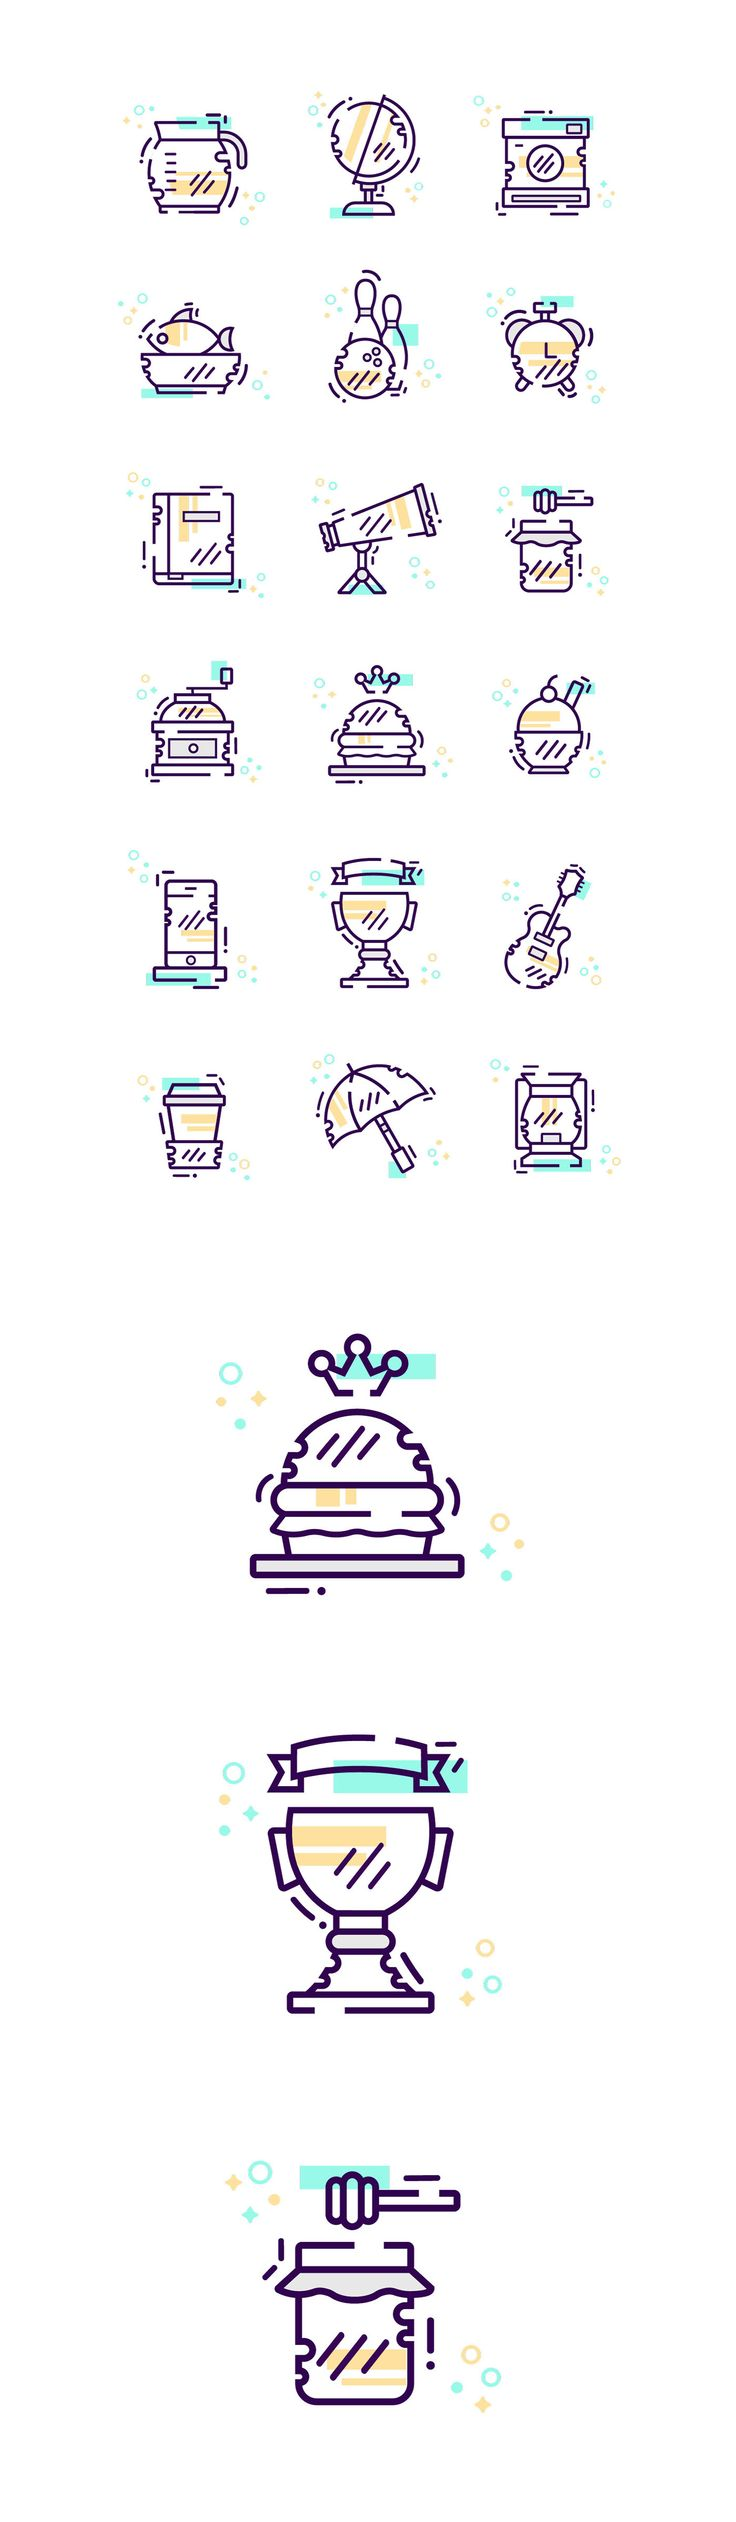 Random icon set on Behance